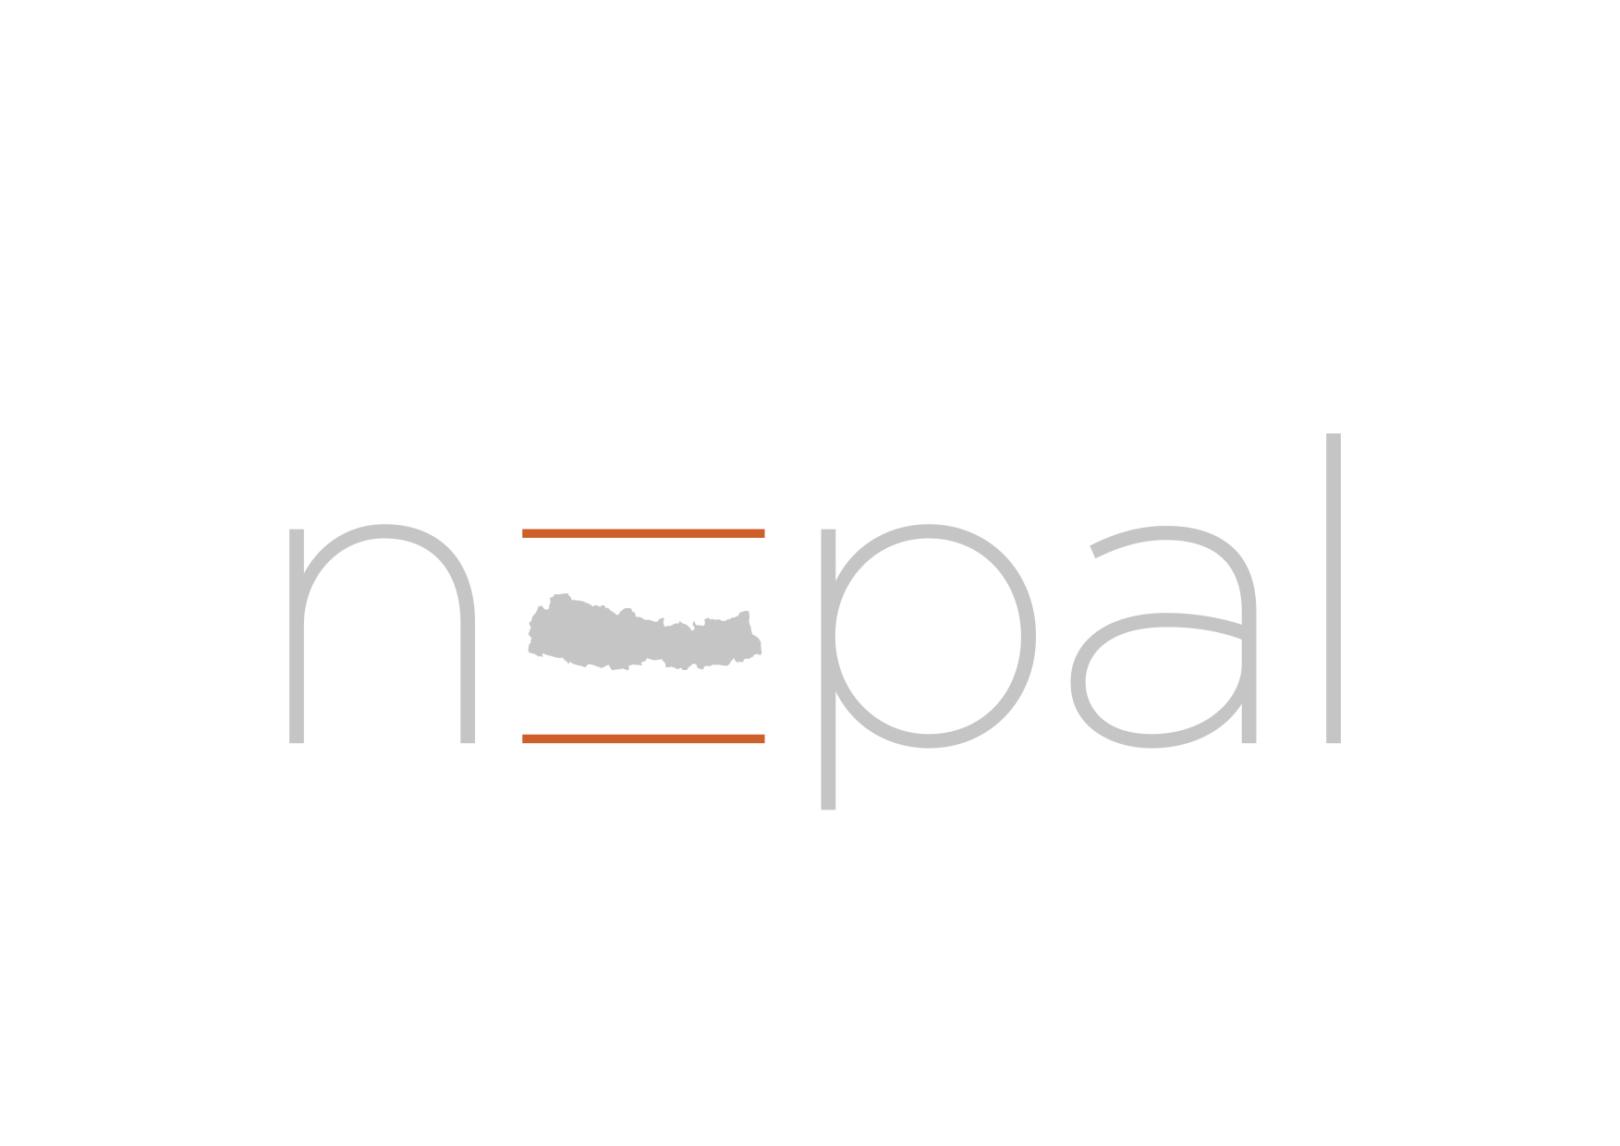 N-pal UB (ungdomsbedrift)